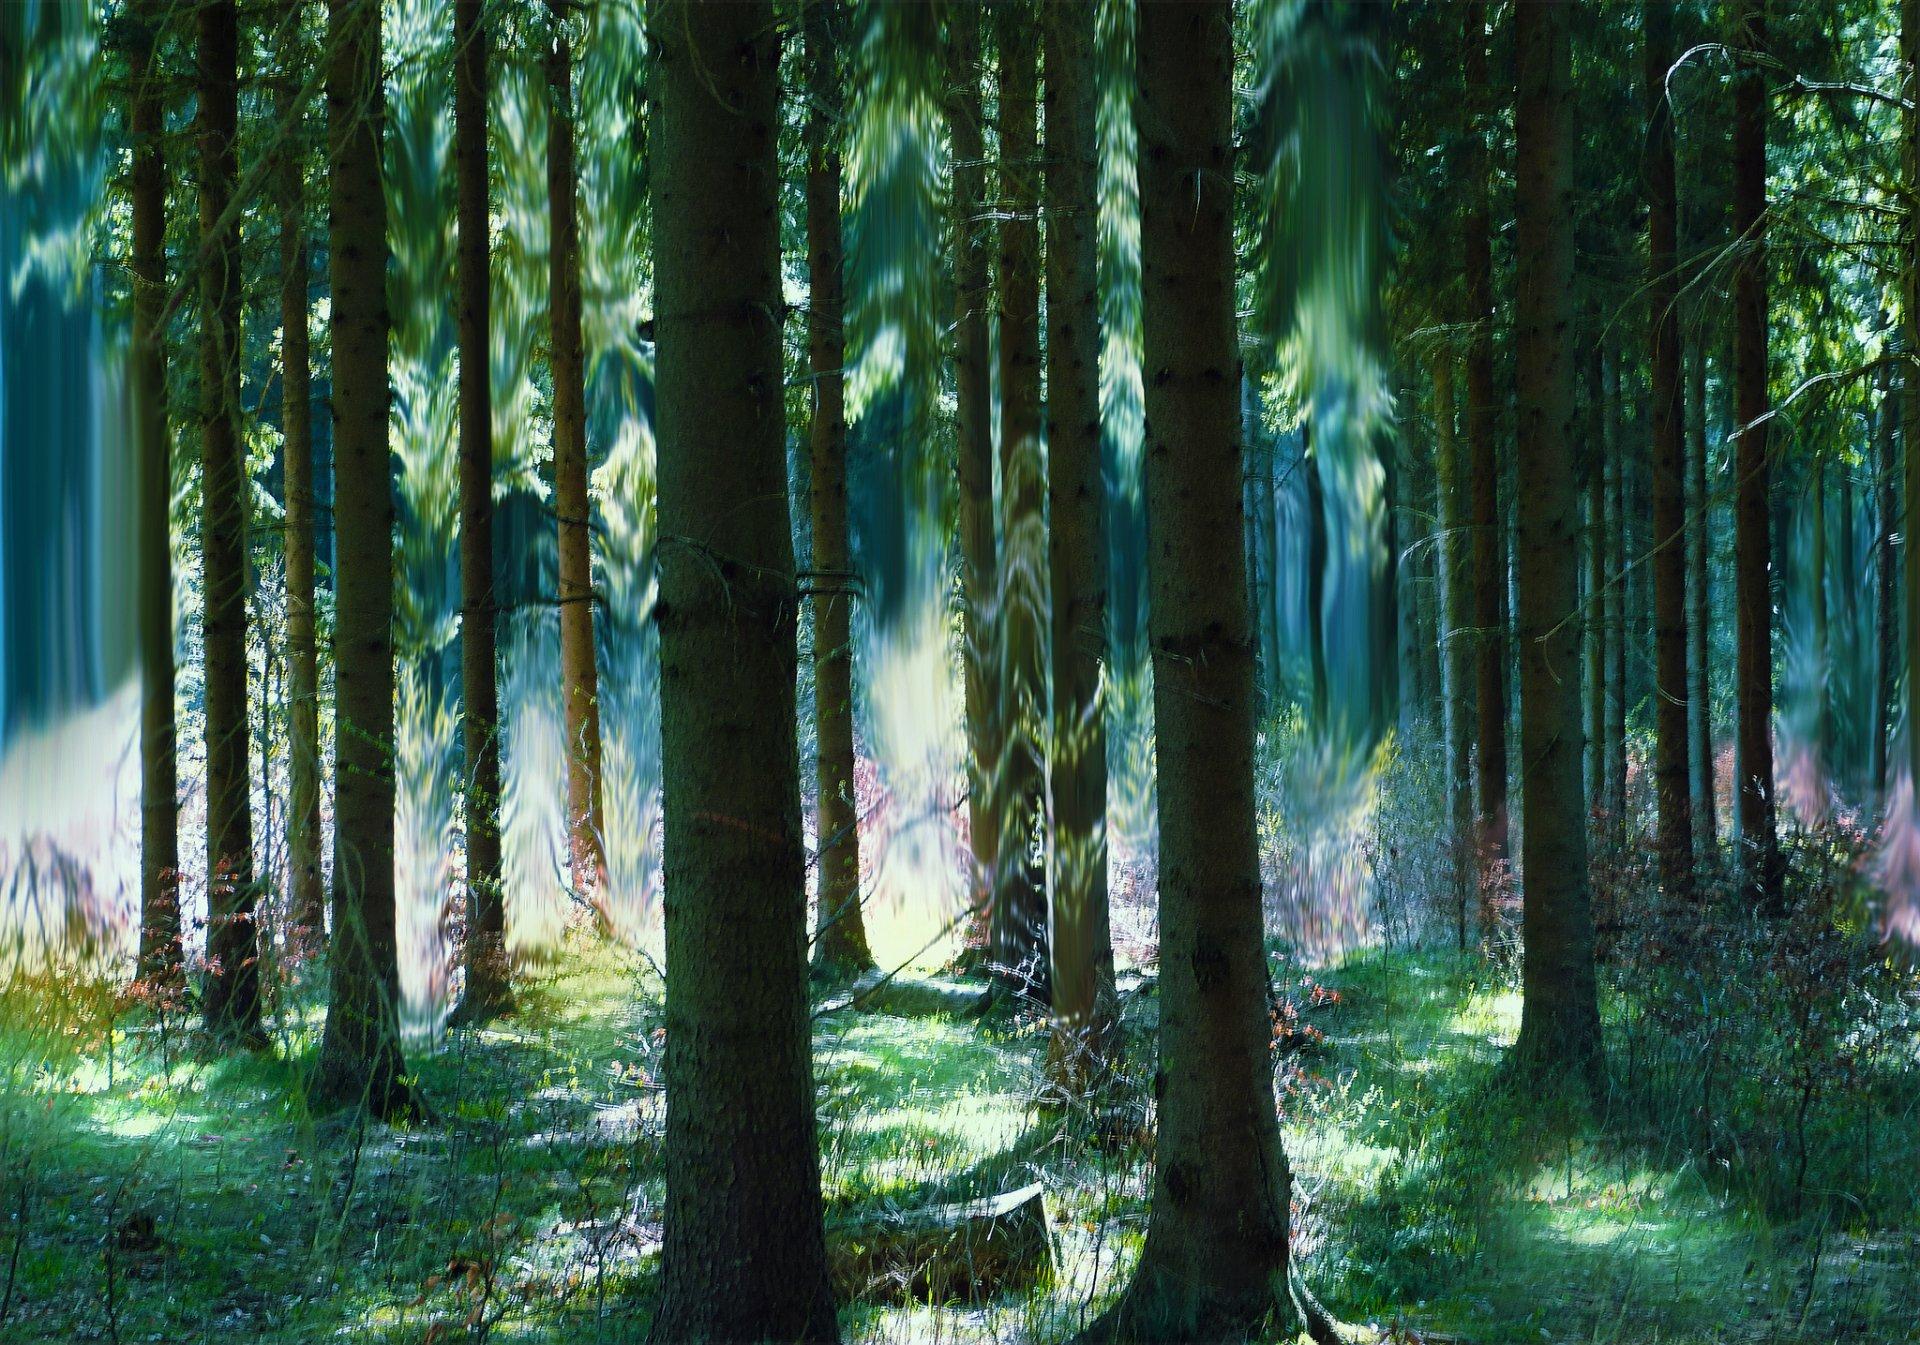 картинка сказочного леса летом нашем салоне